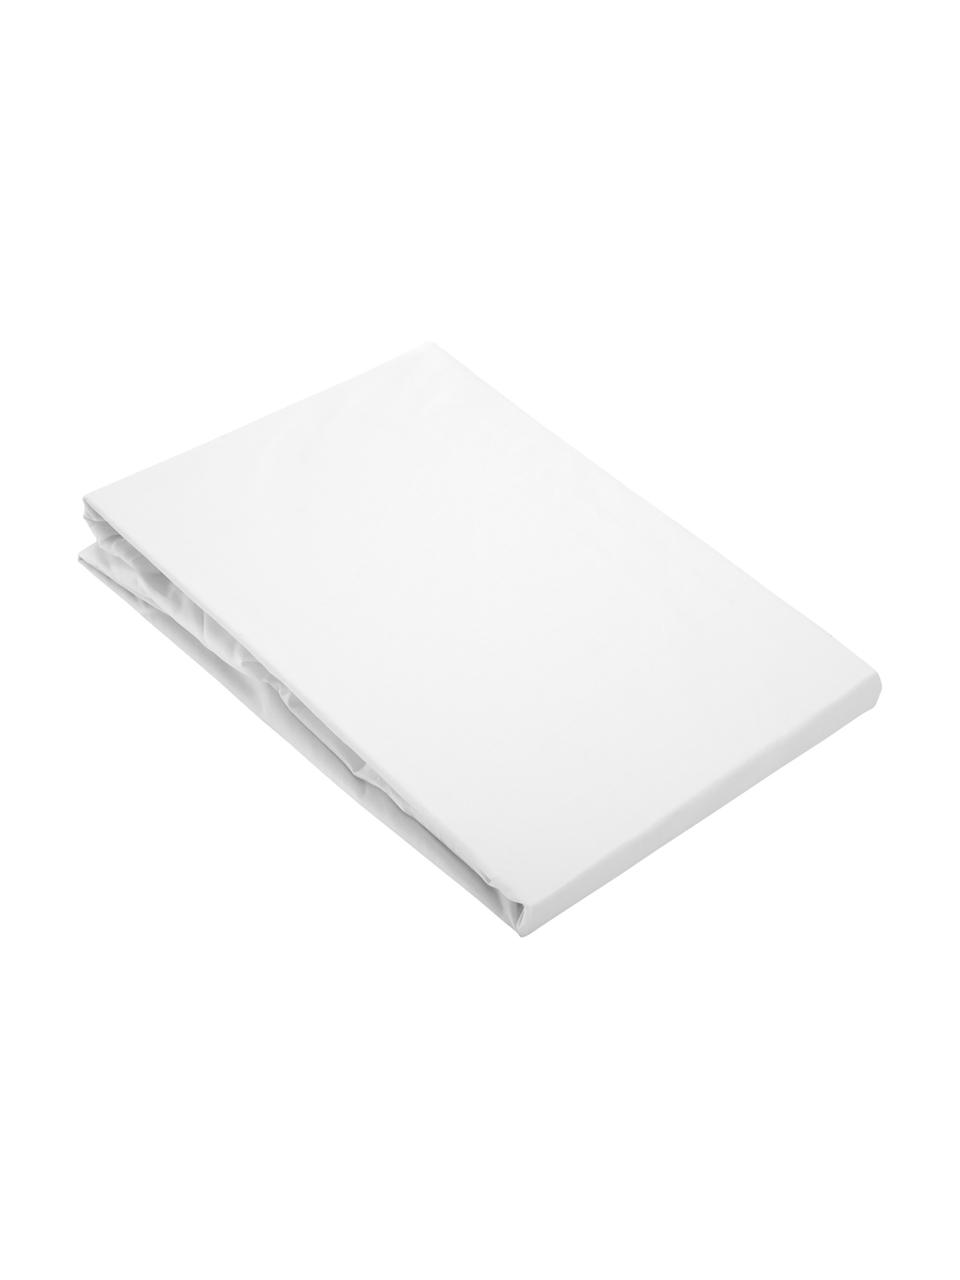 Lenzuolo con angoli in percalle Elsie, Tessuto: percalle, Bianco, Larg. 180 x Lung. 200 cm